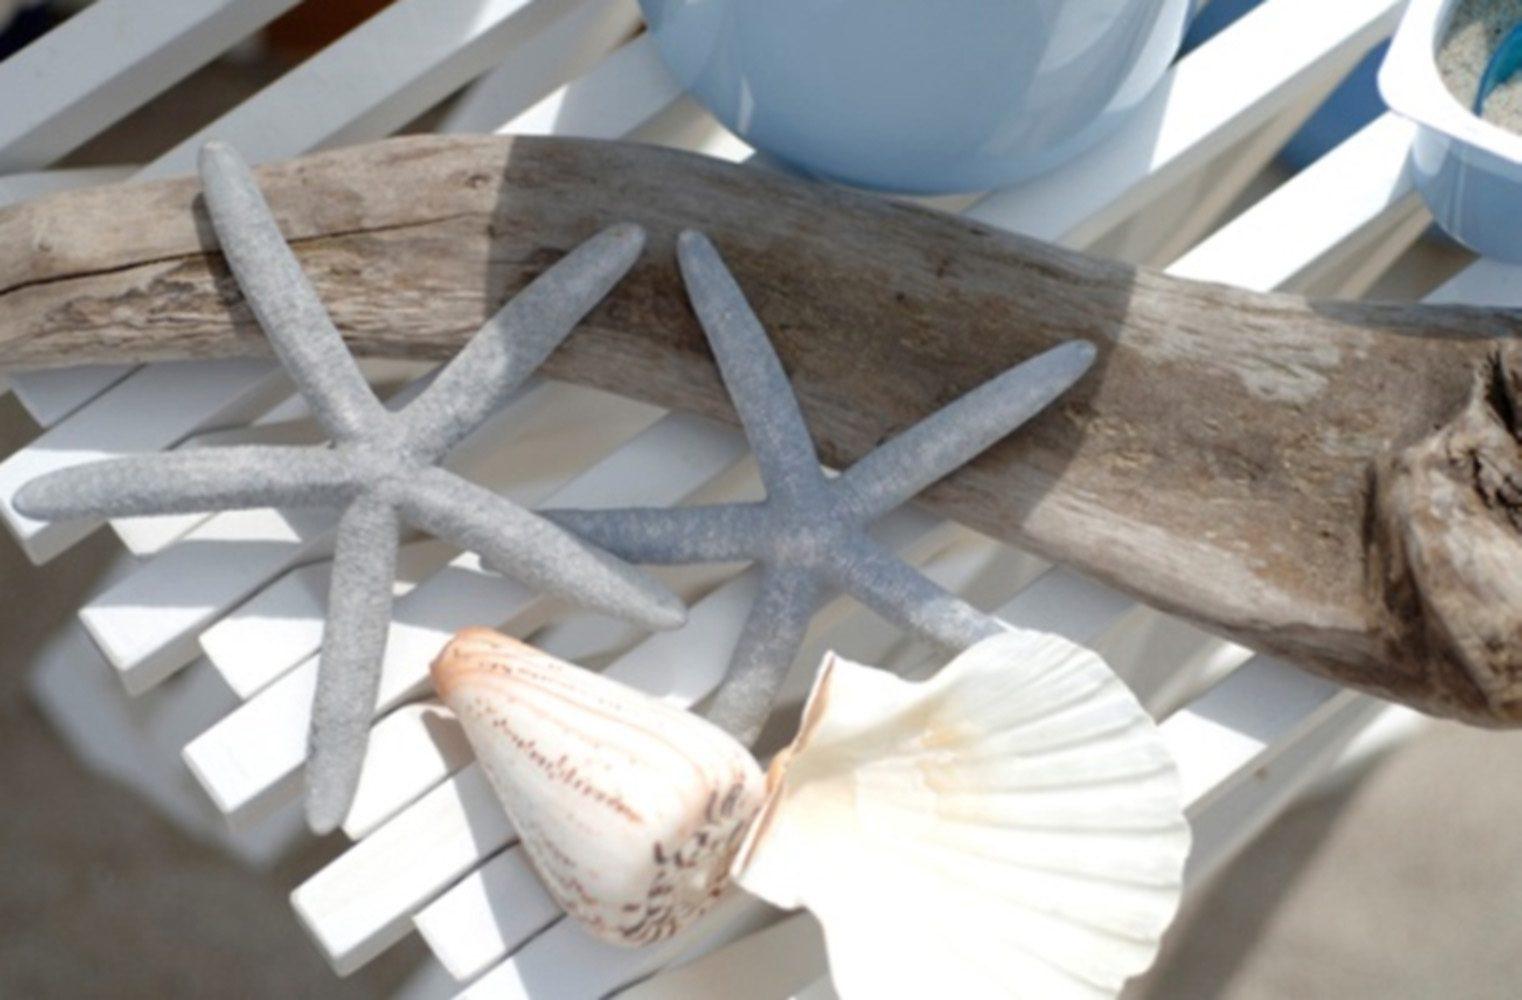 Premium collection by Home affaire Leinwandbild »Stars & Shells«, 118/78 cm